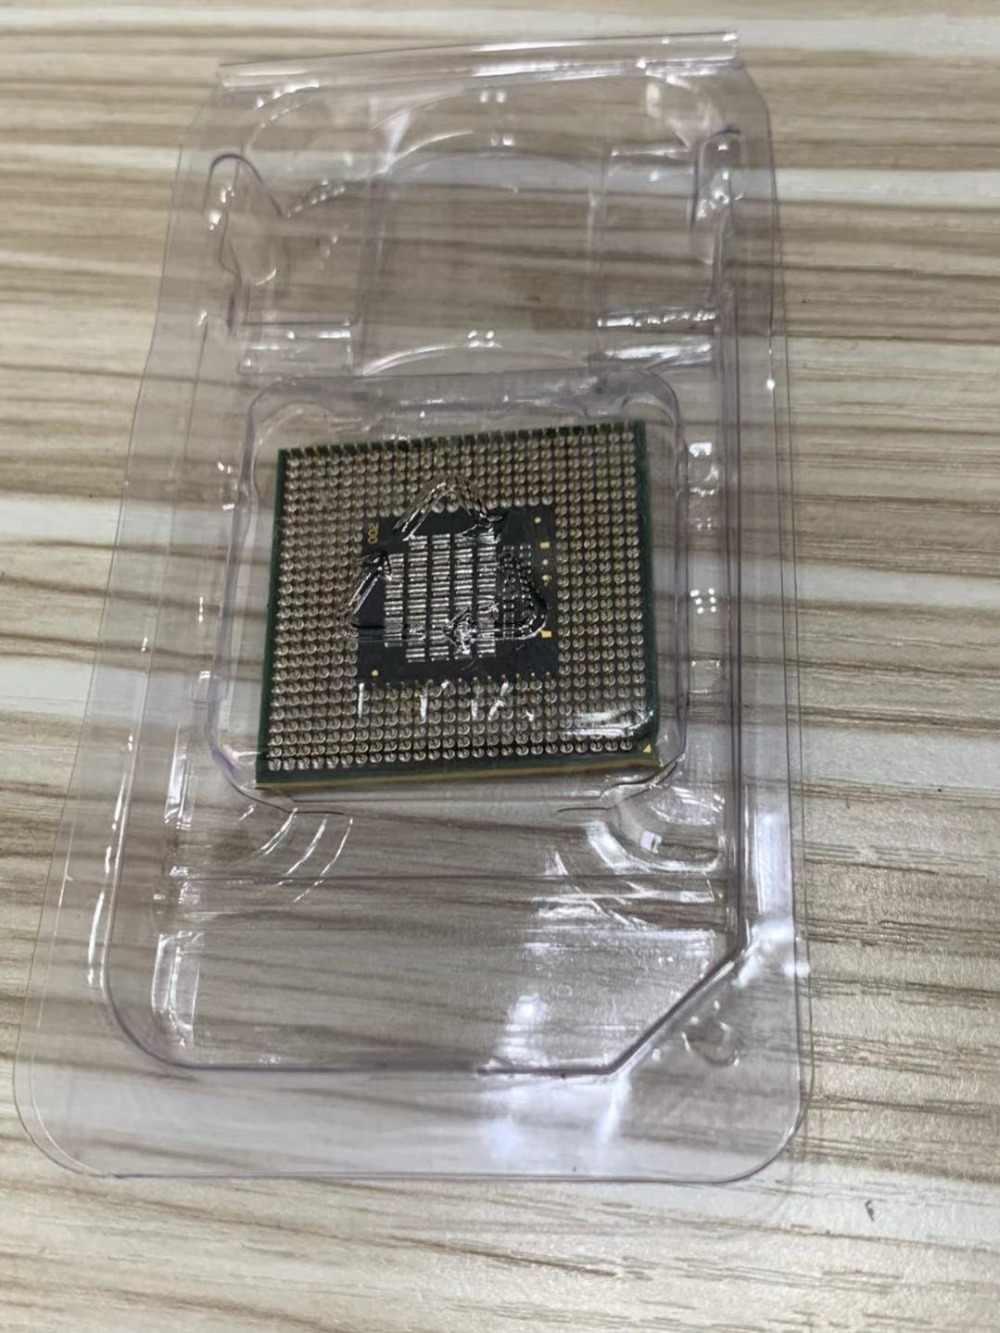 T8100 8100 מעבד 3M Cache/2.1GHz/800/Dual-Core Socket 479 מחשב נייד מעבד עבור GM45 PM45 משלוח חינם